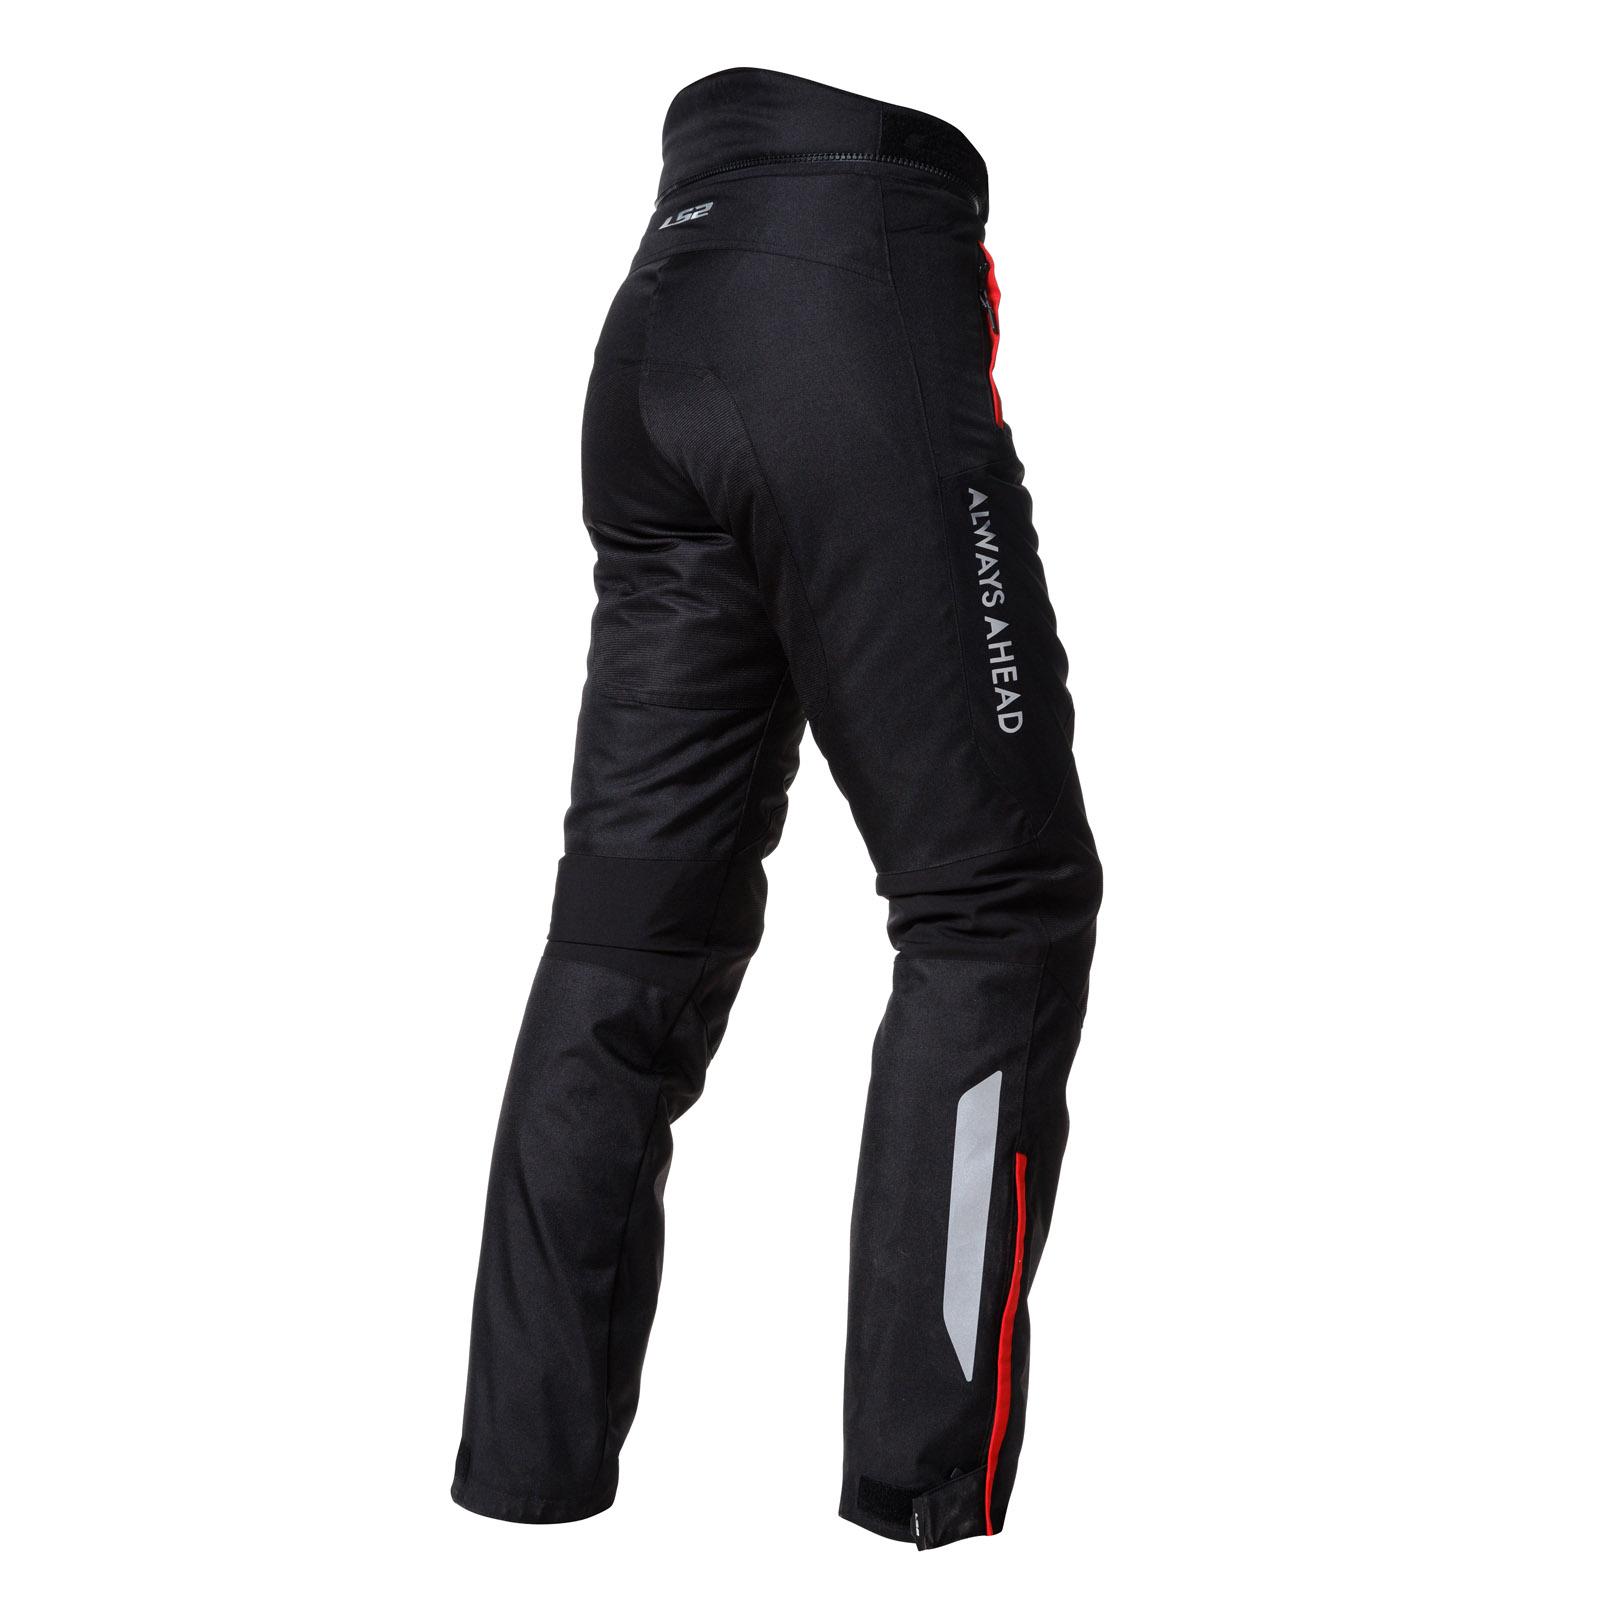 pantalon ls2 chart negro mujer talle s